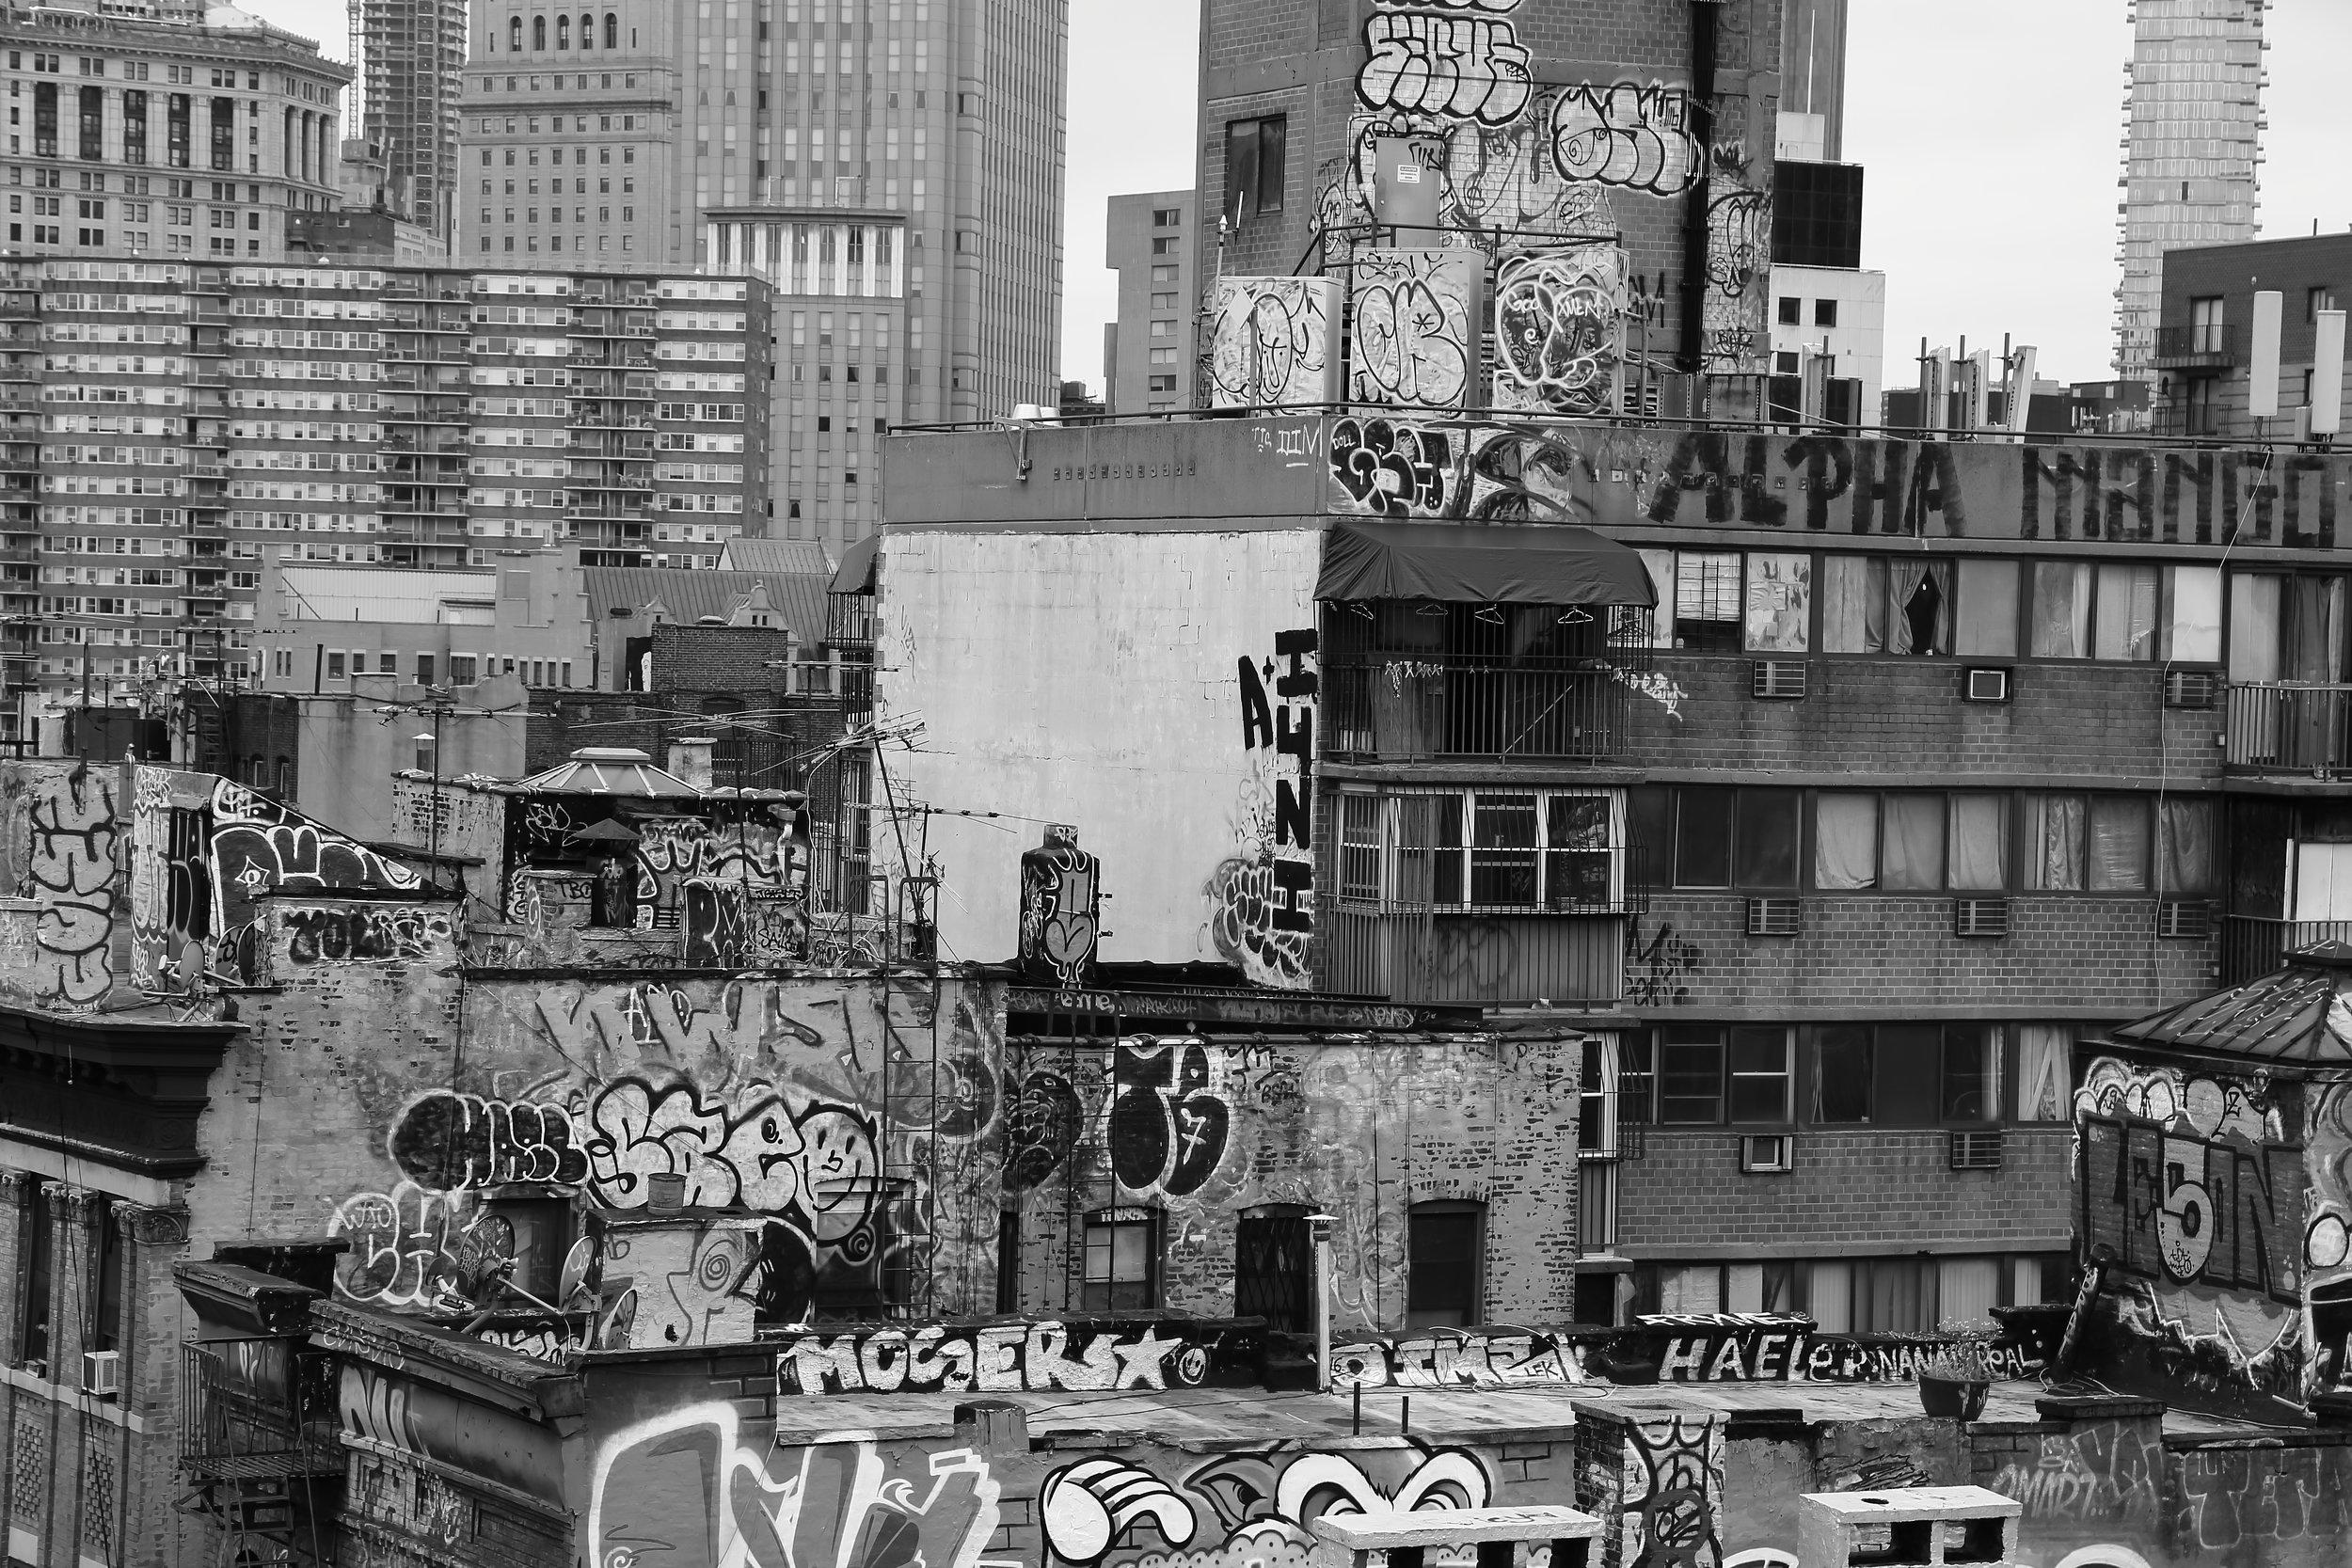 Roof-Top-Grafitti-Shot7-11-2017.JPG